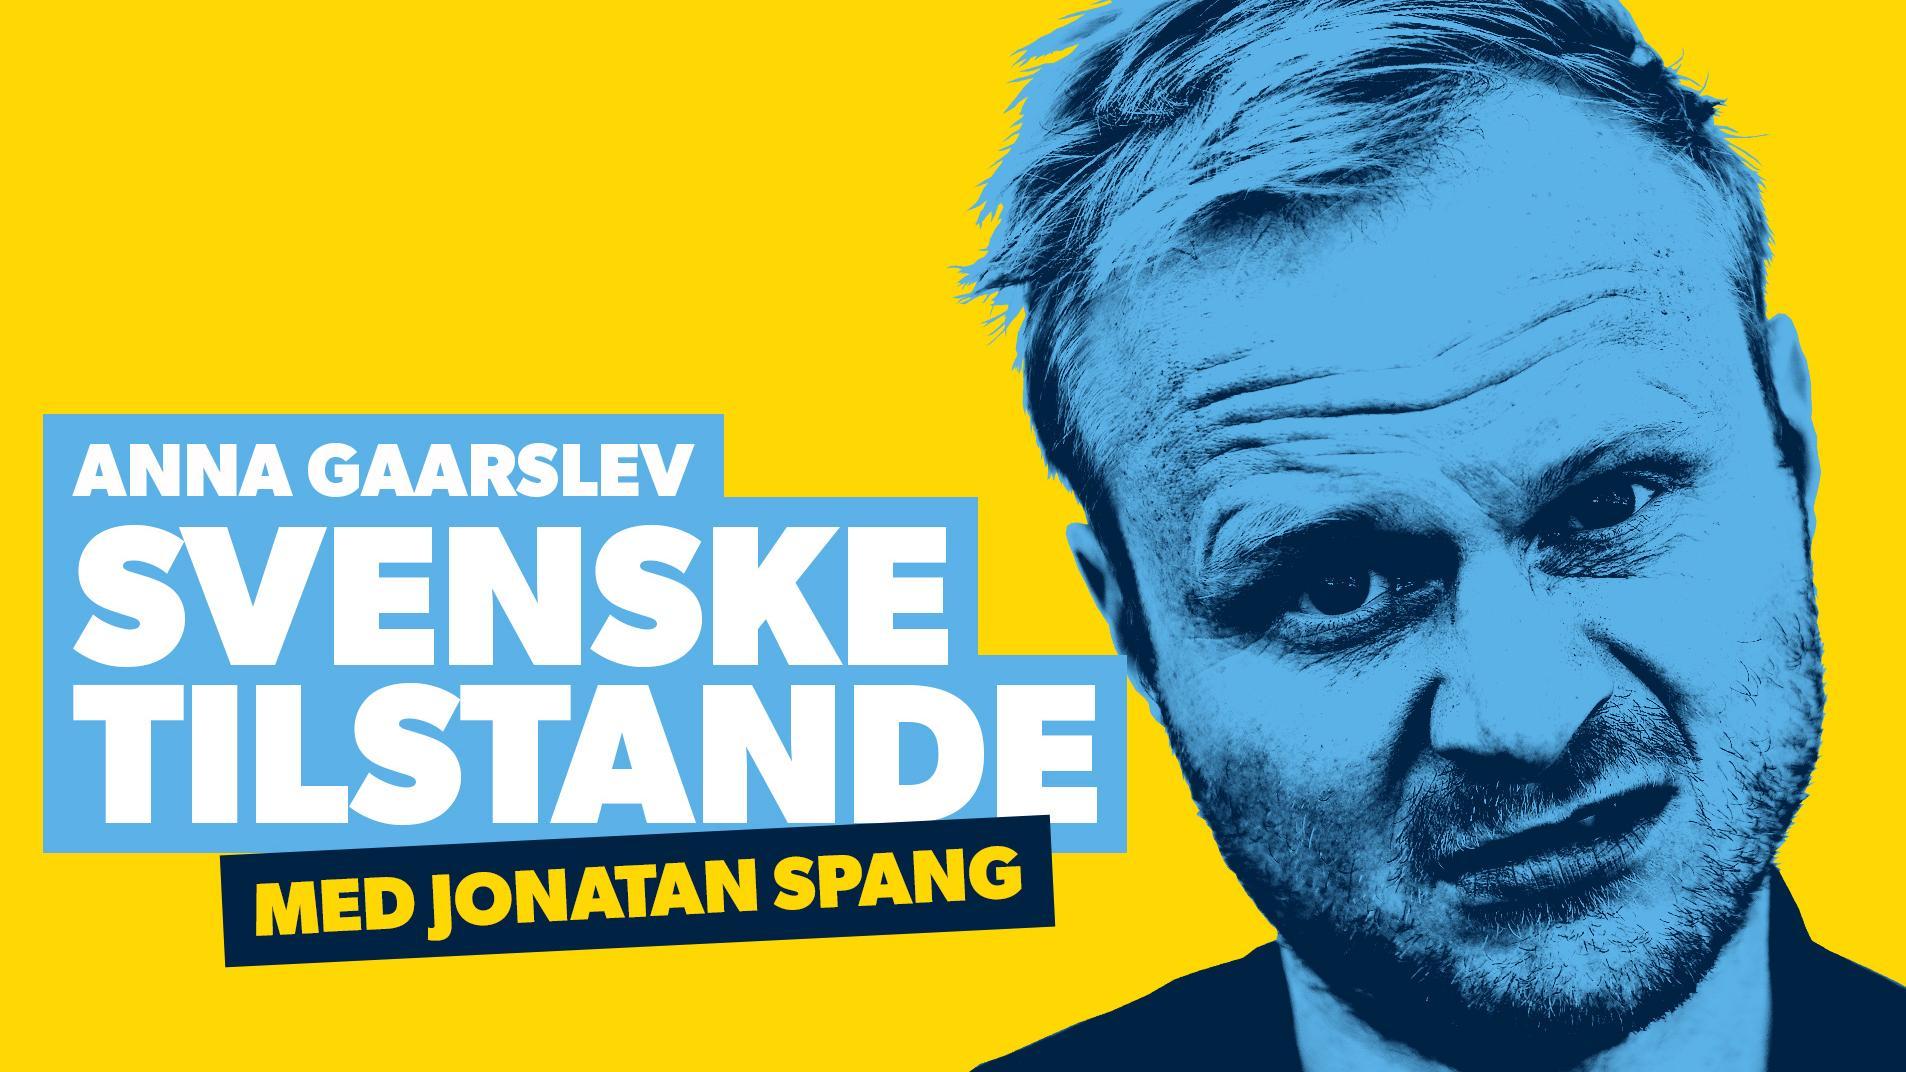 svensk_podcast_jonatan_16-9_v002.jpg